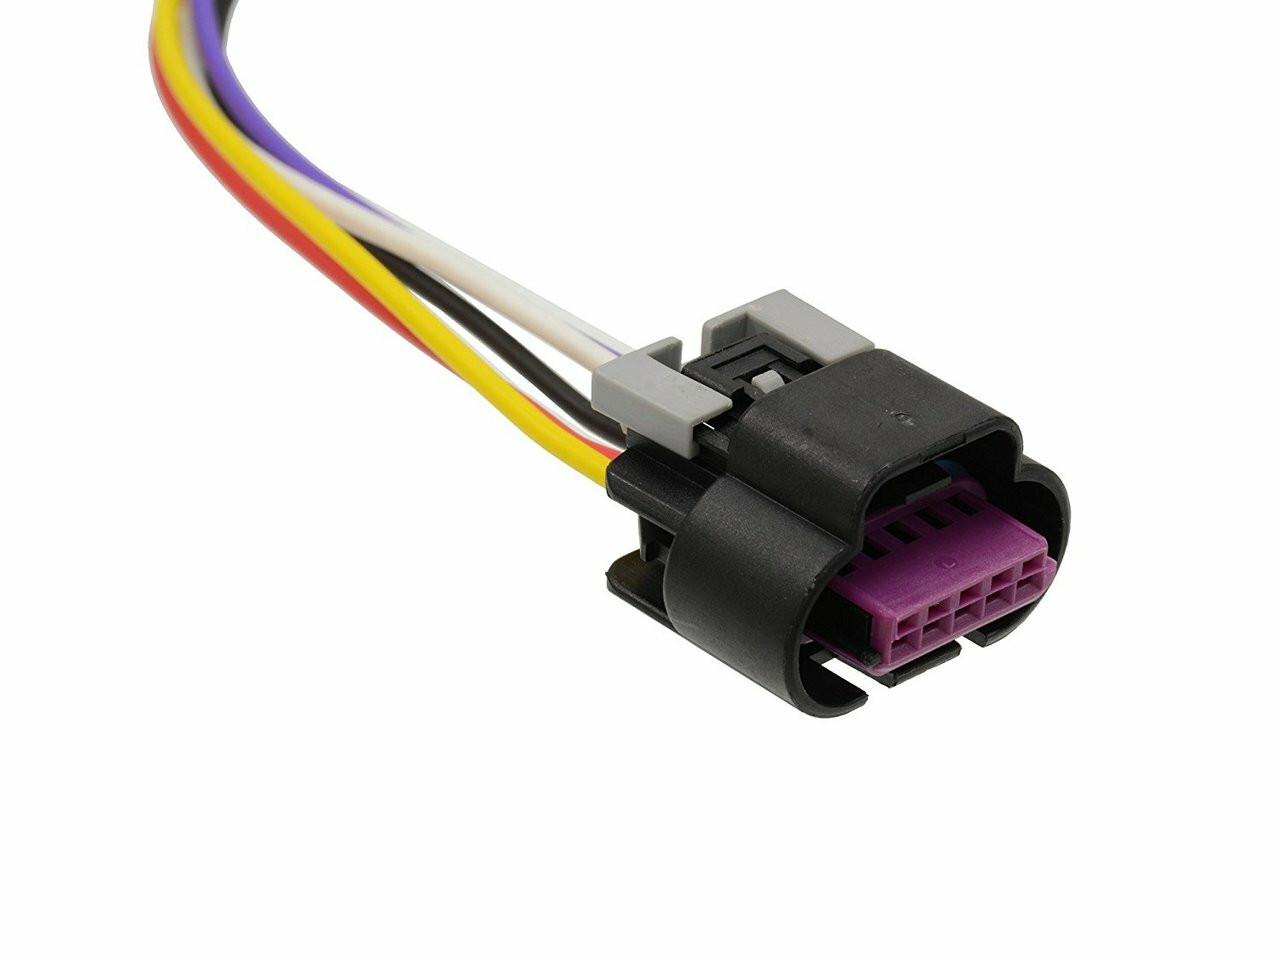 Gm 5 3 Maf Wiring - Wiring Diagrams Dash M Air Flow Sensor Wire Wiring Diagram on